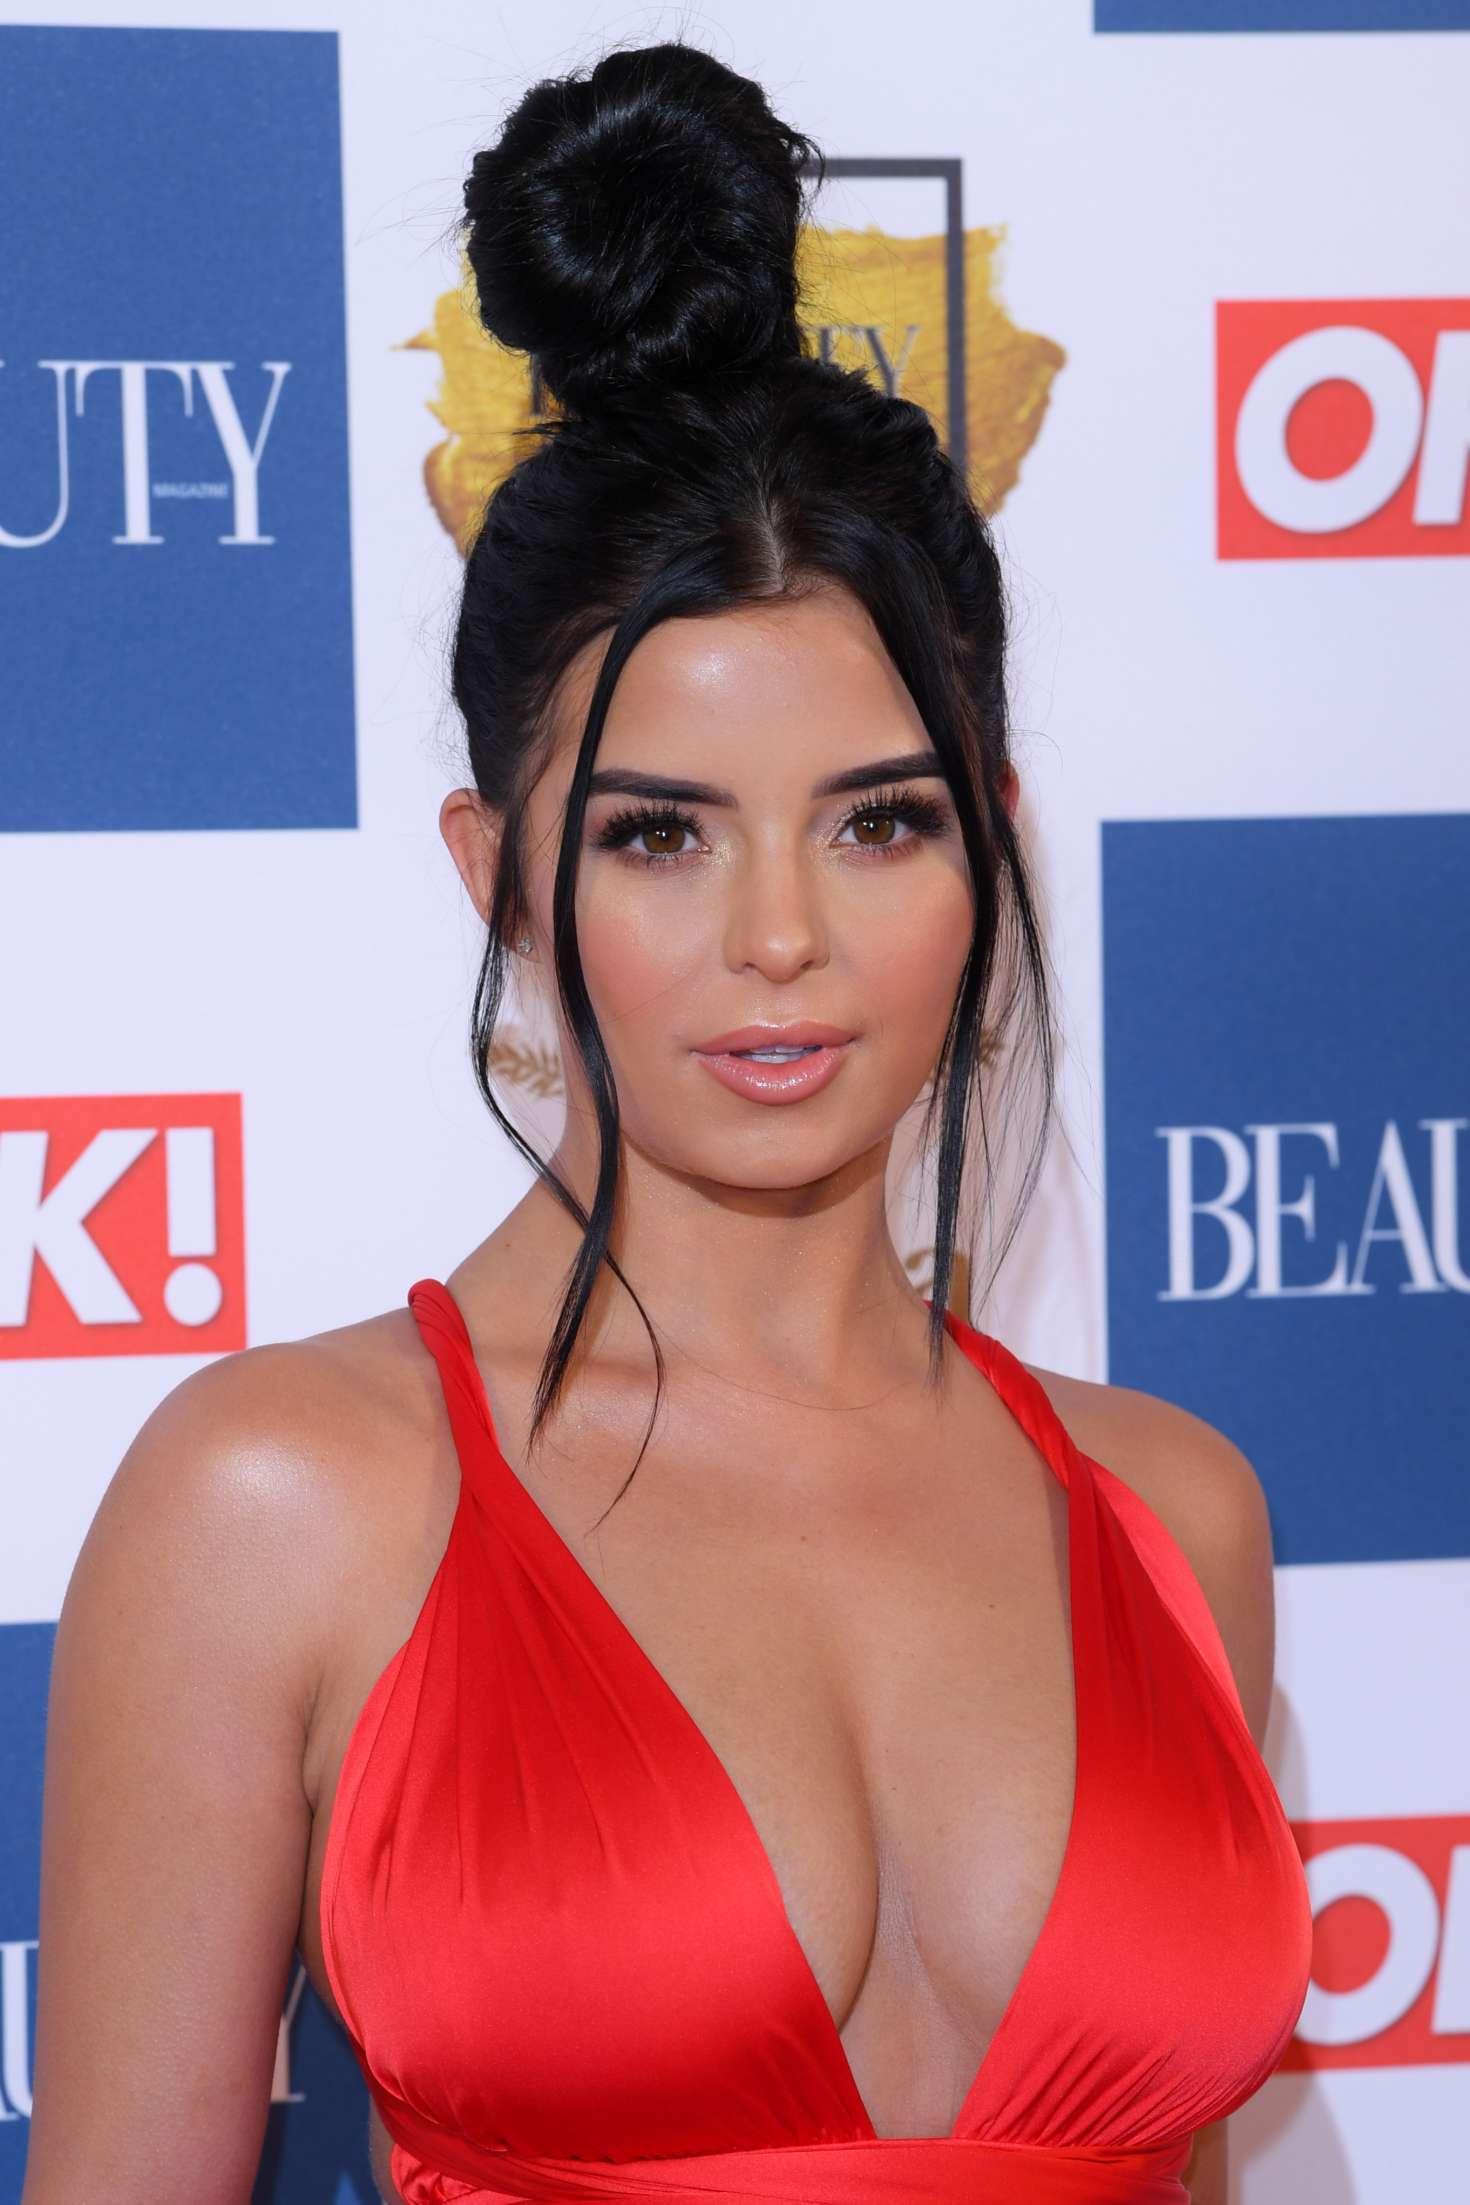 Demi Rose 2017 Beauty Awards In London Indian Girls